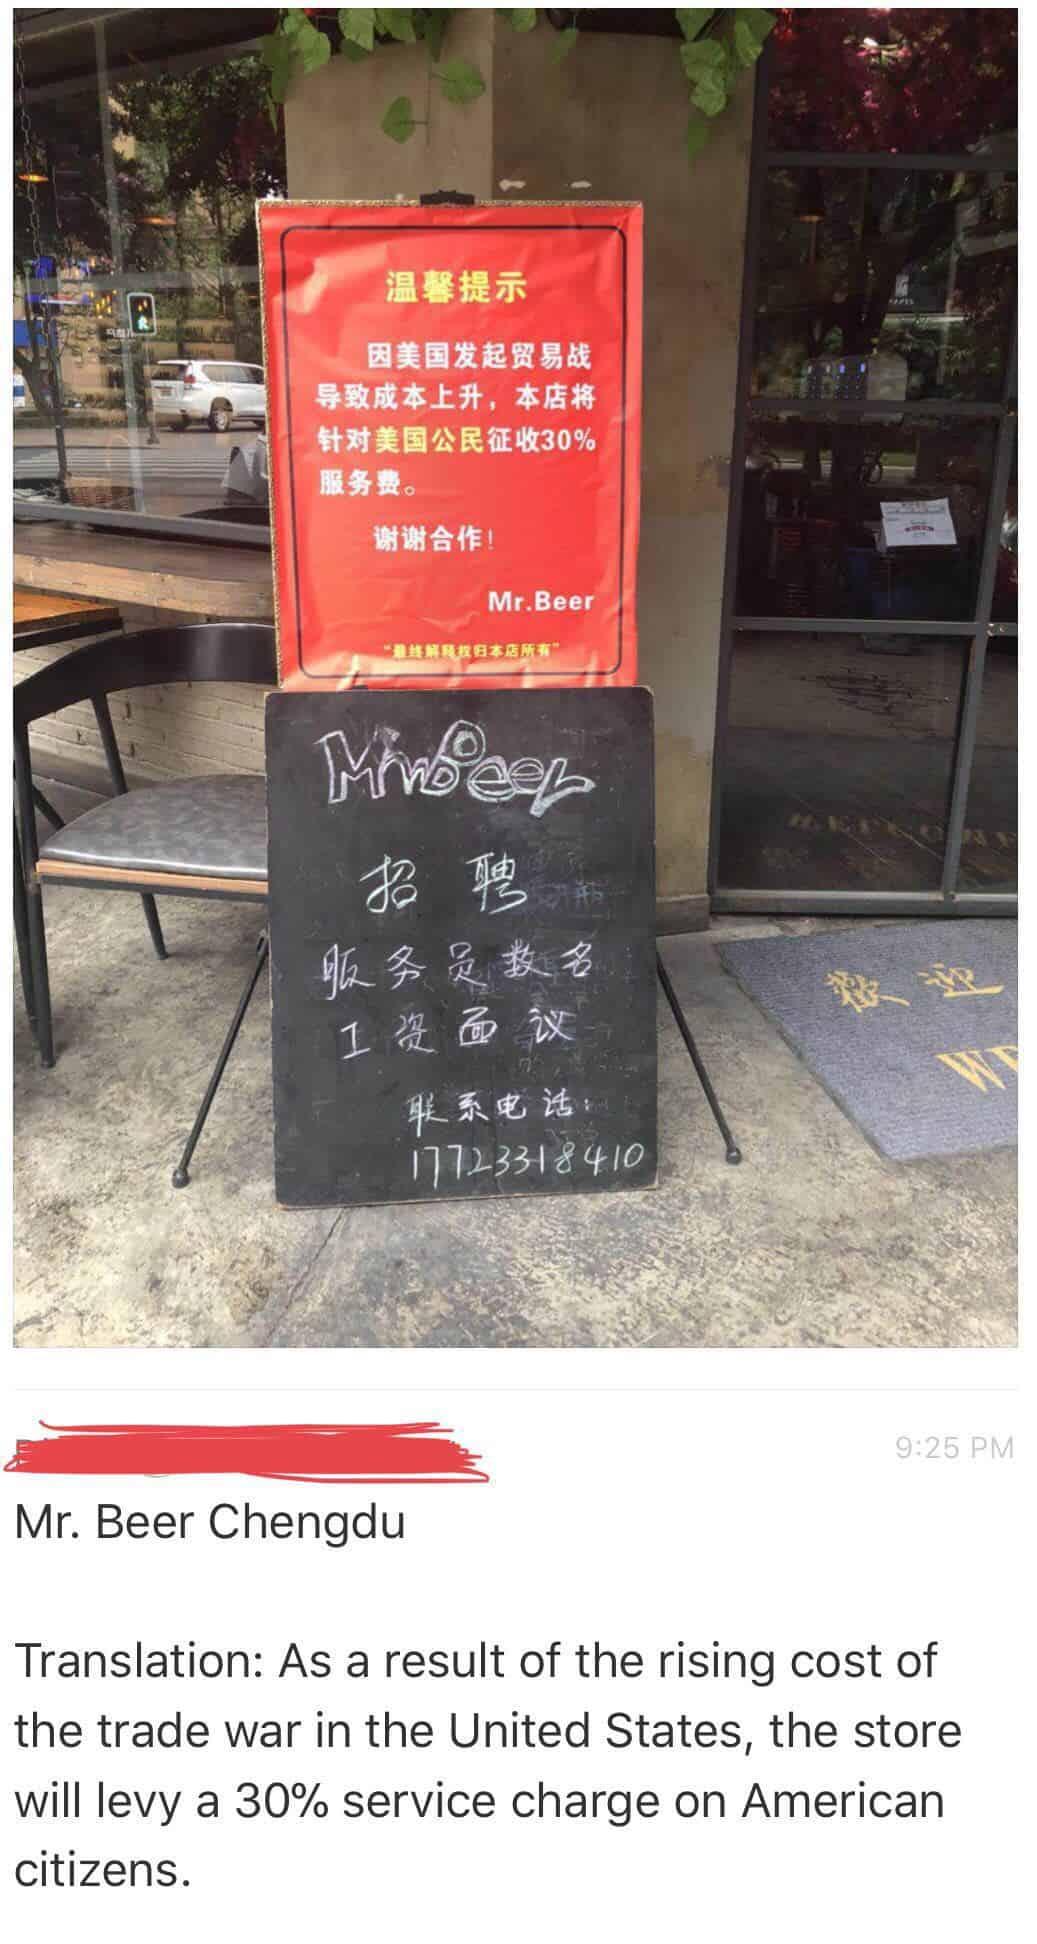 chengdu-expat-mr-beer-trade-war